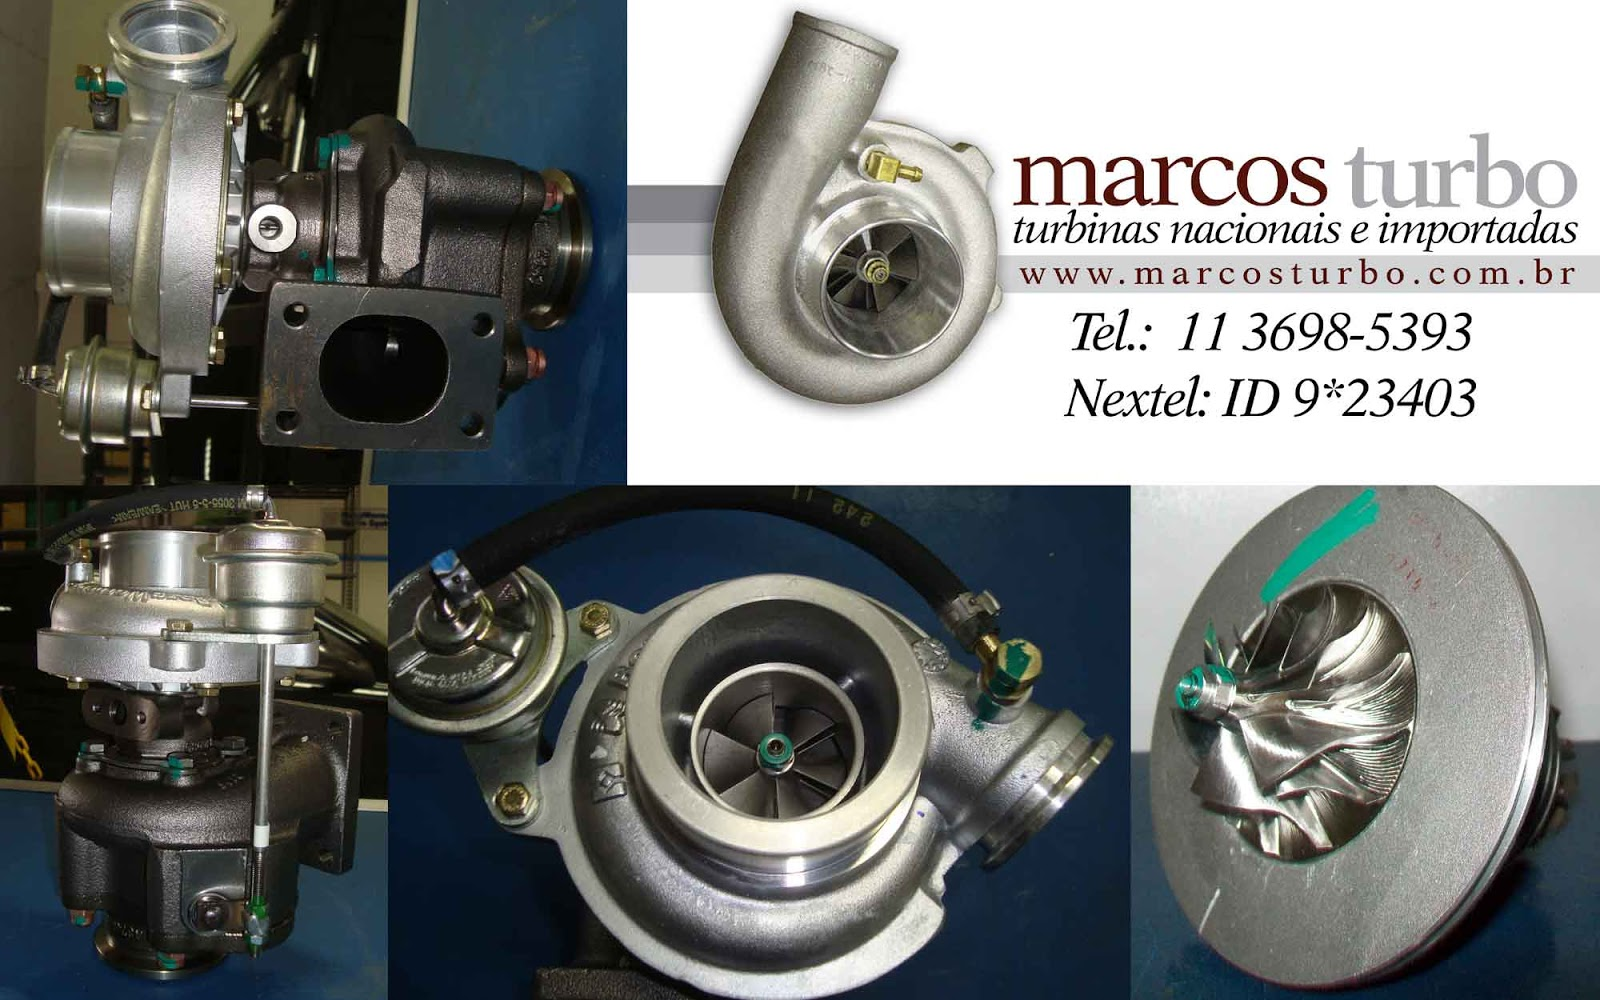 Marcos Turbo Turbinas Turbos Www Marcosturbo Com Br Turbina Ford